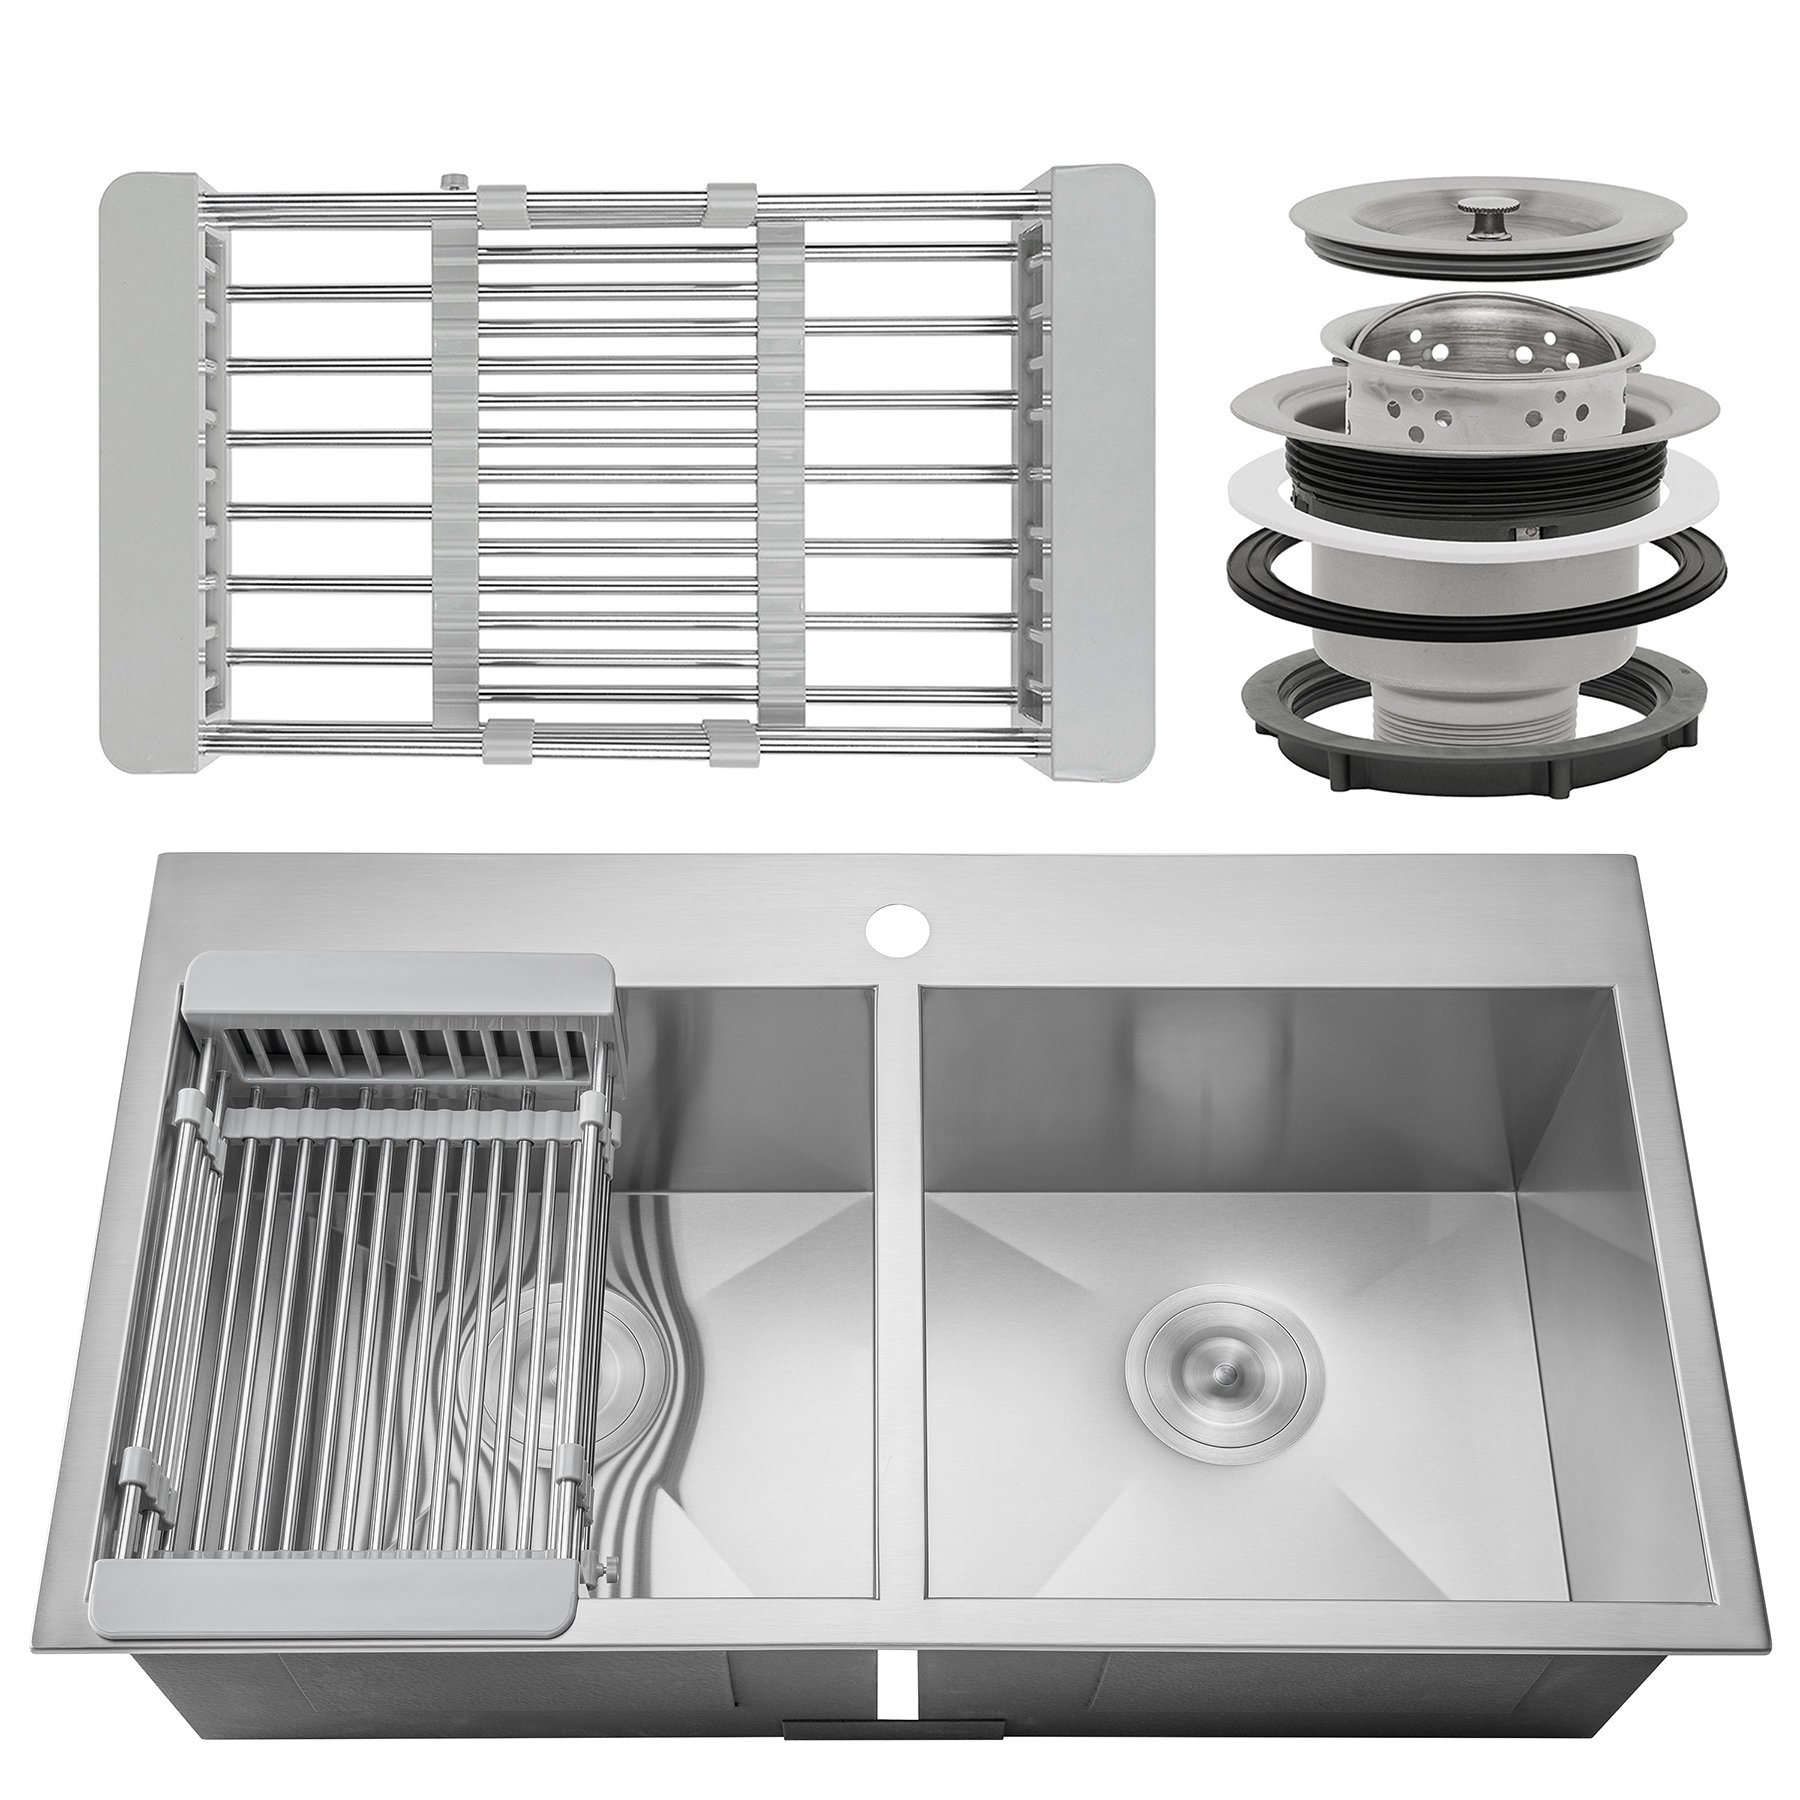 Firebird 32'' x 18'' x 9'' Handmade 18 Gauge 50/50 Double Bowl Basin Topmount Drop-in Kitchen Sink w/ Adjustable Dish Tray & Strainer